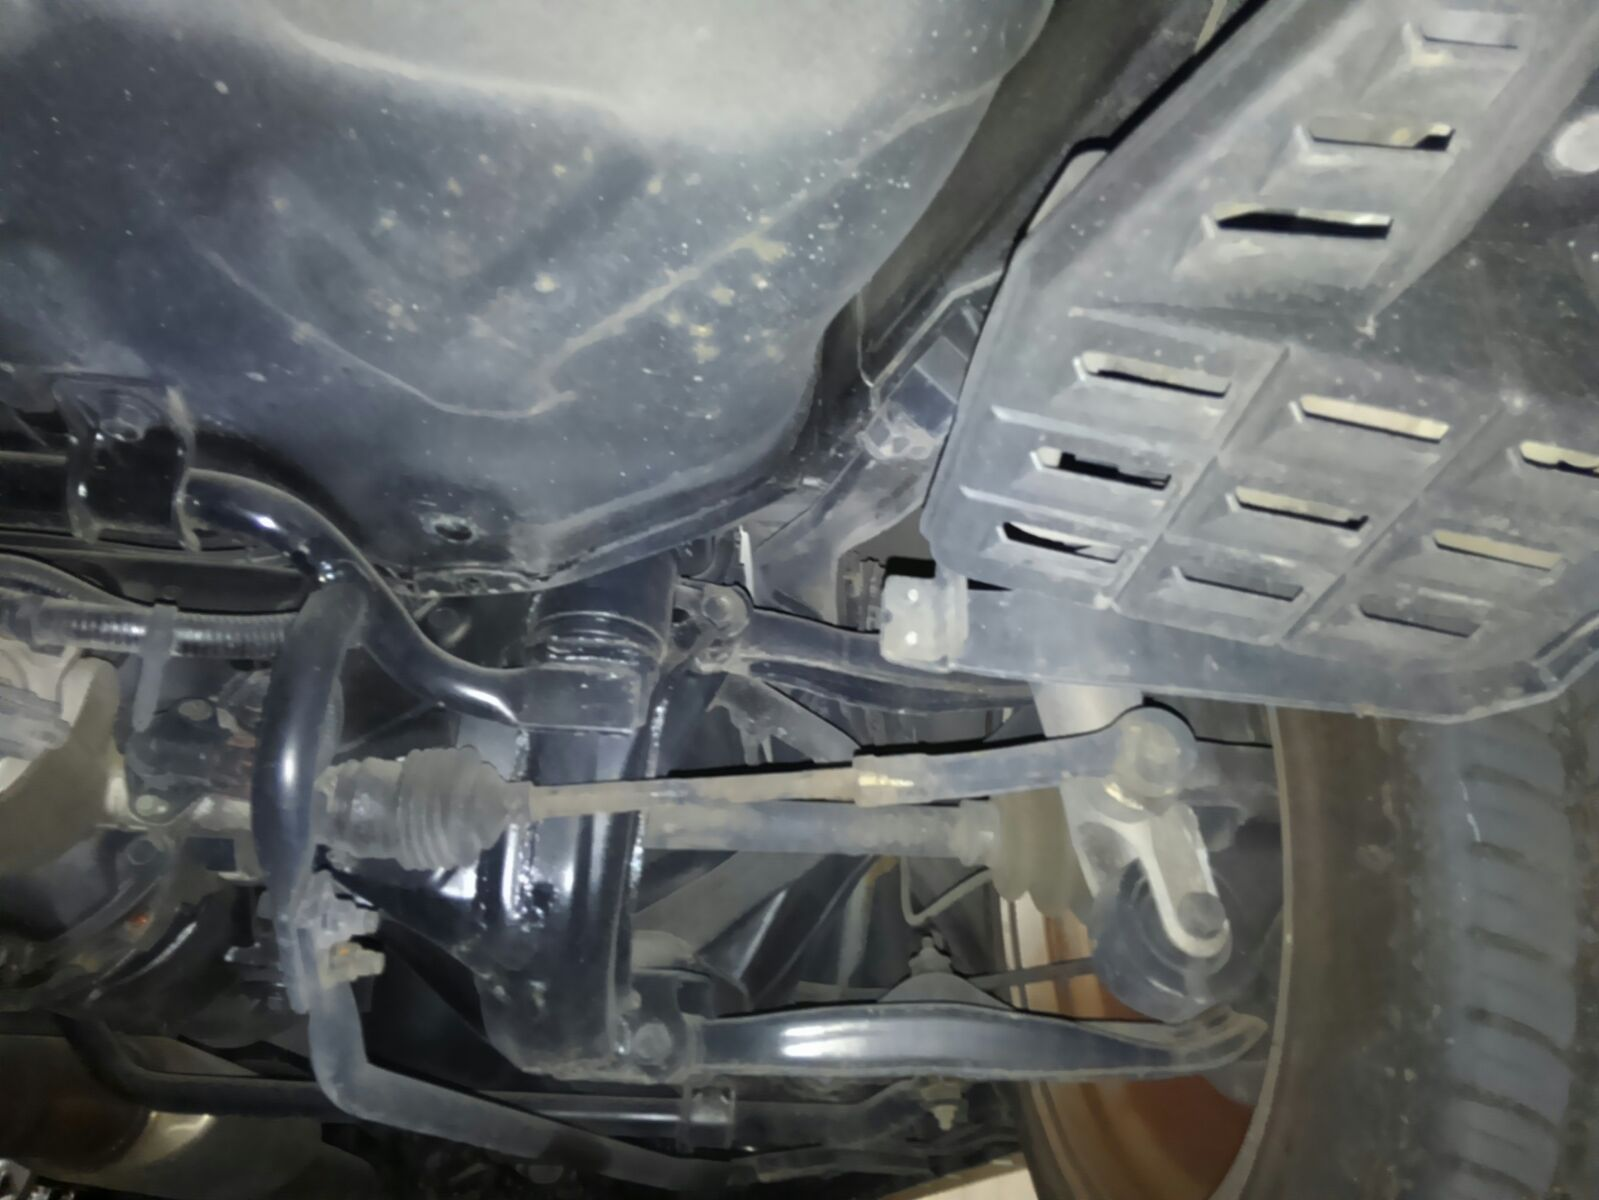 1998 Nissan Skyline R33 GTR rust 5